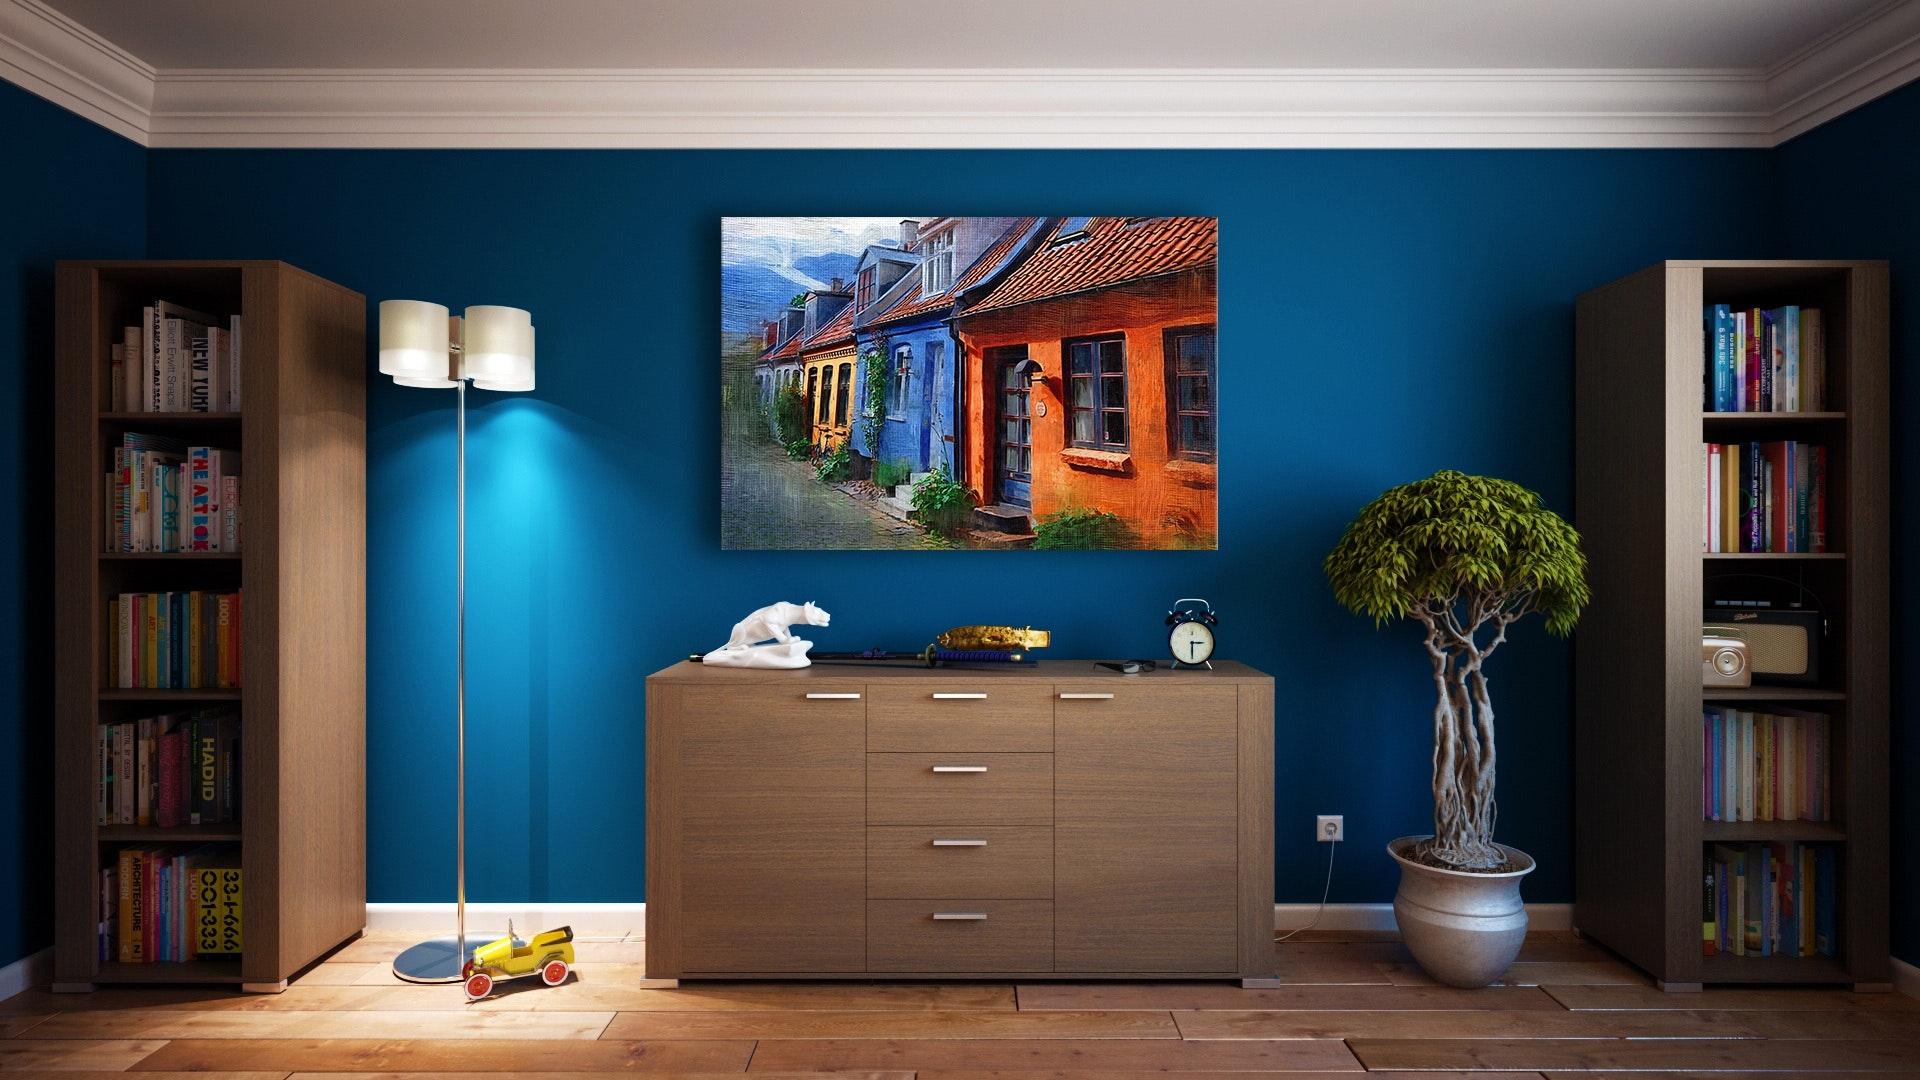 room-apartment-architecture-bookcase-271816.jpg